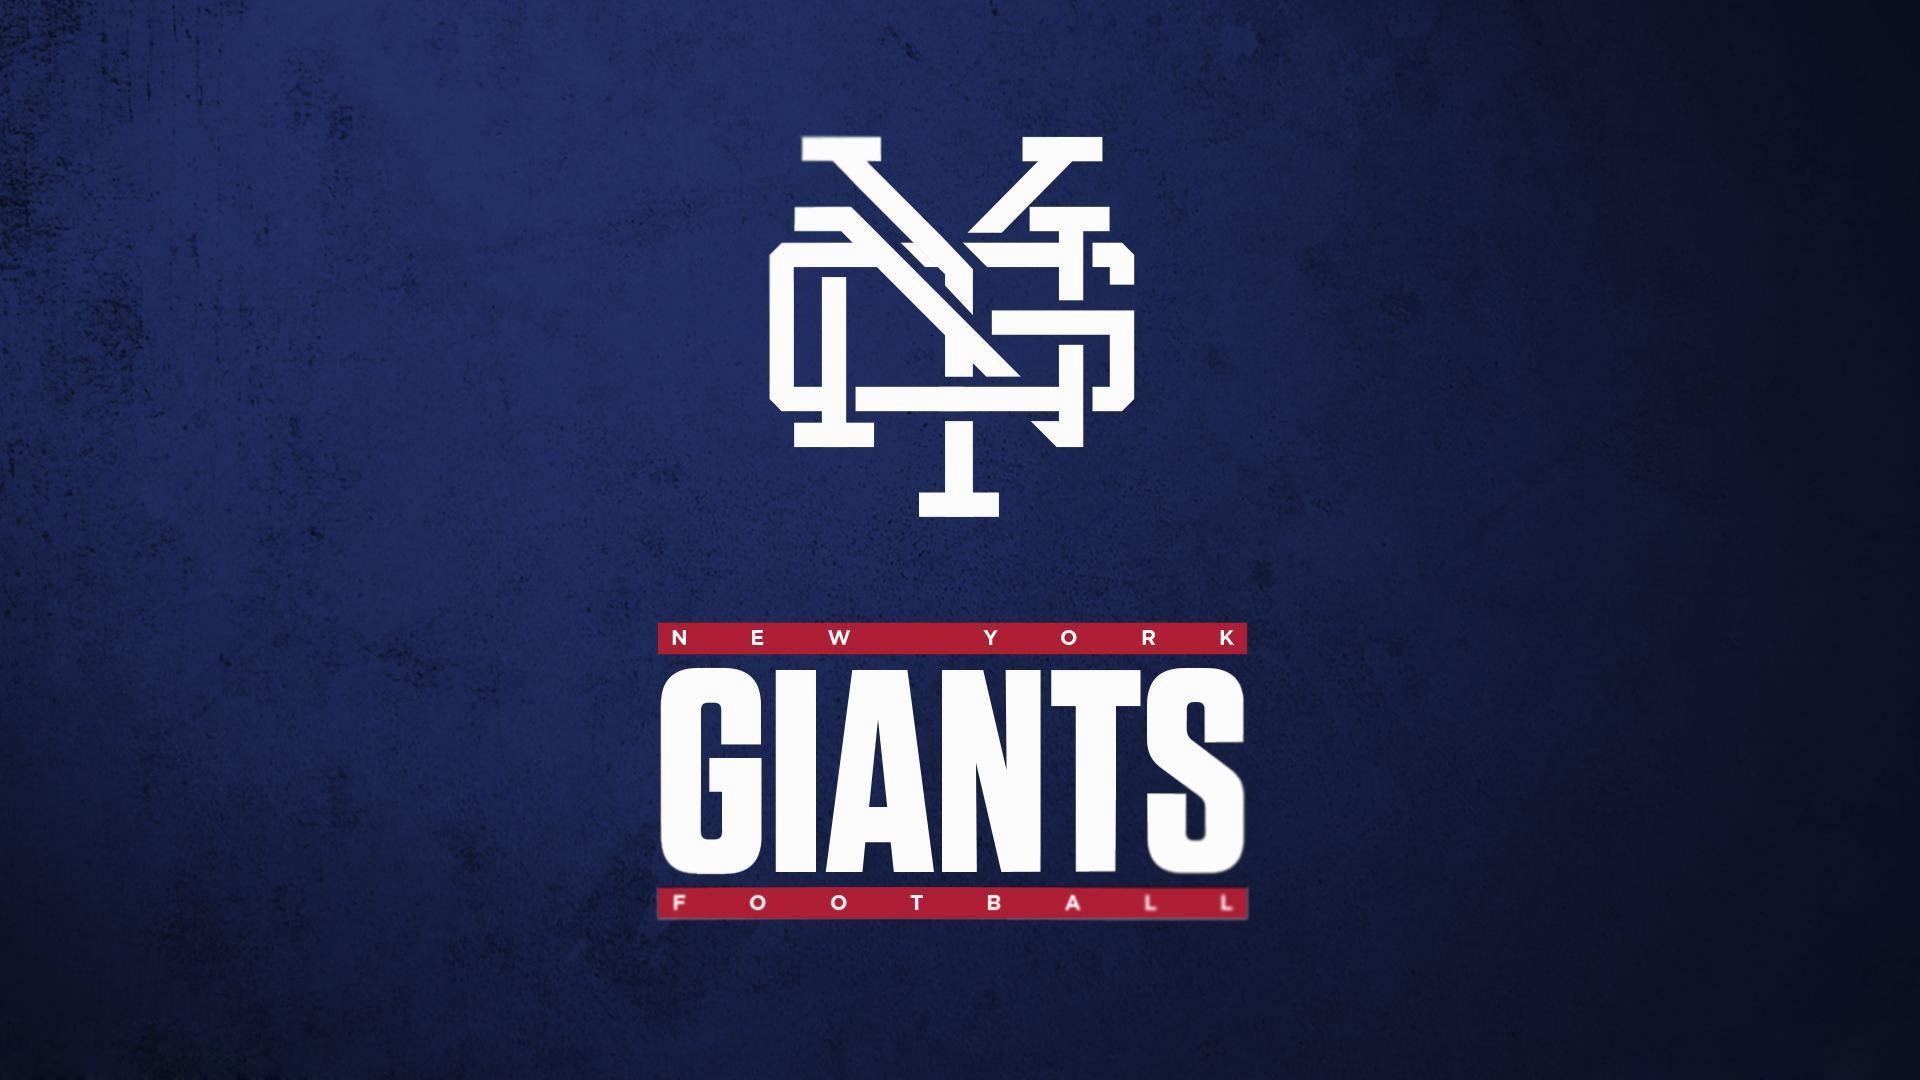 New-york-giants-wallpapers-hd